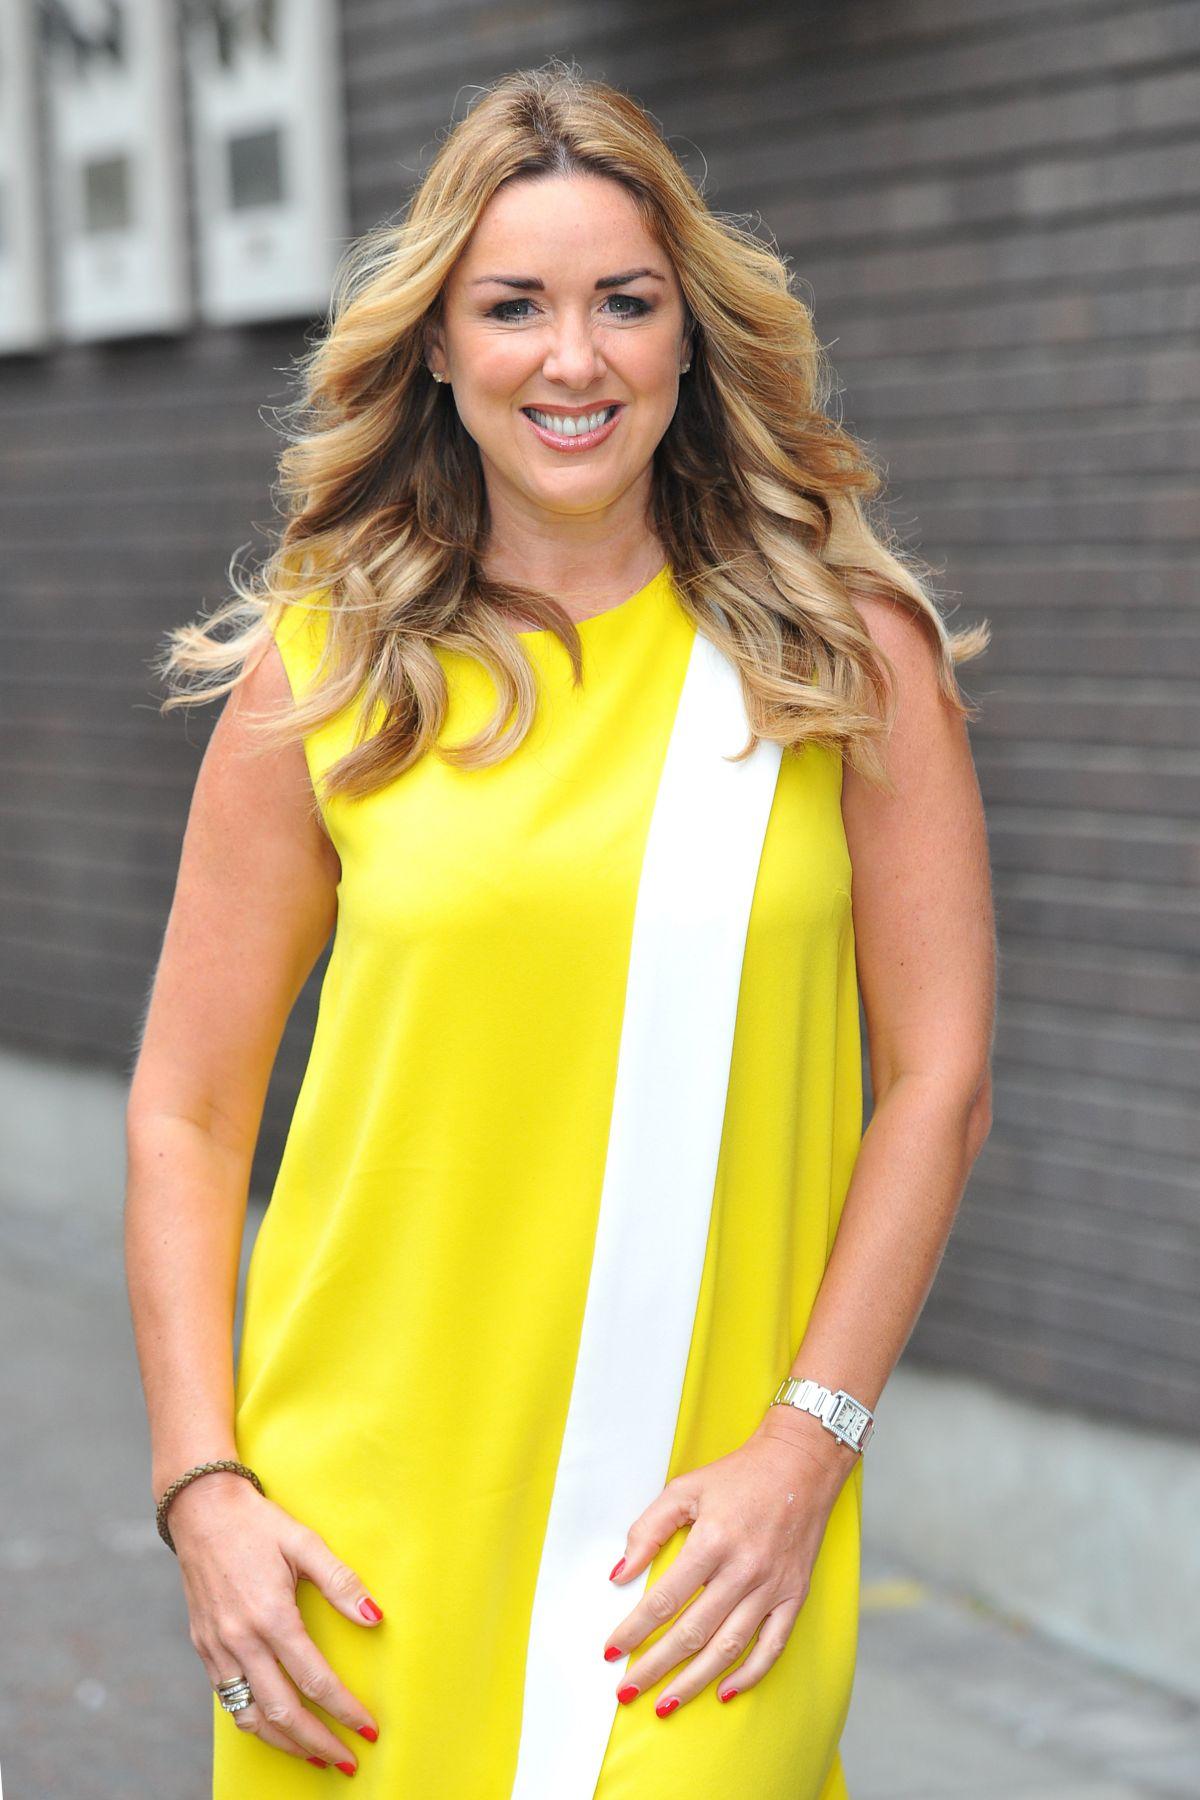 Claire Sweeney net worth